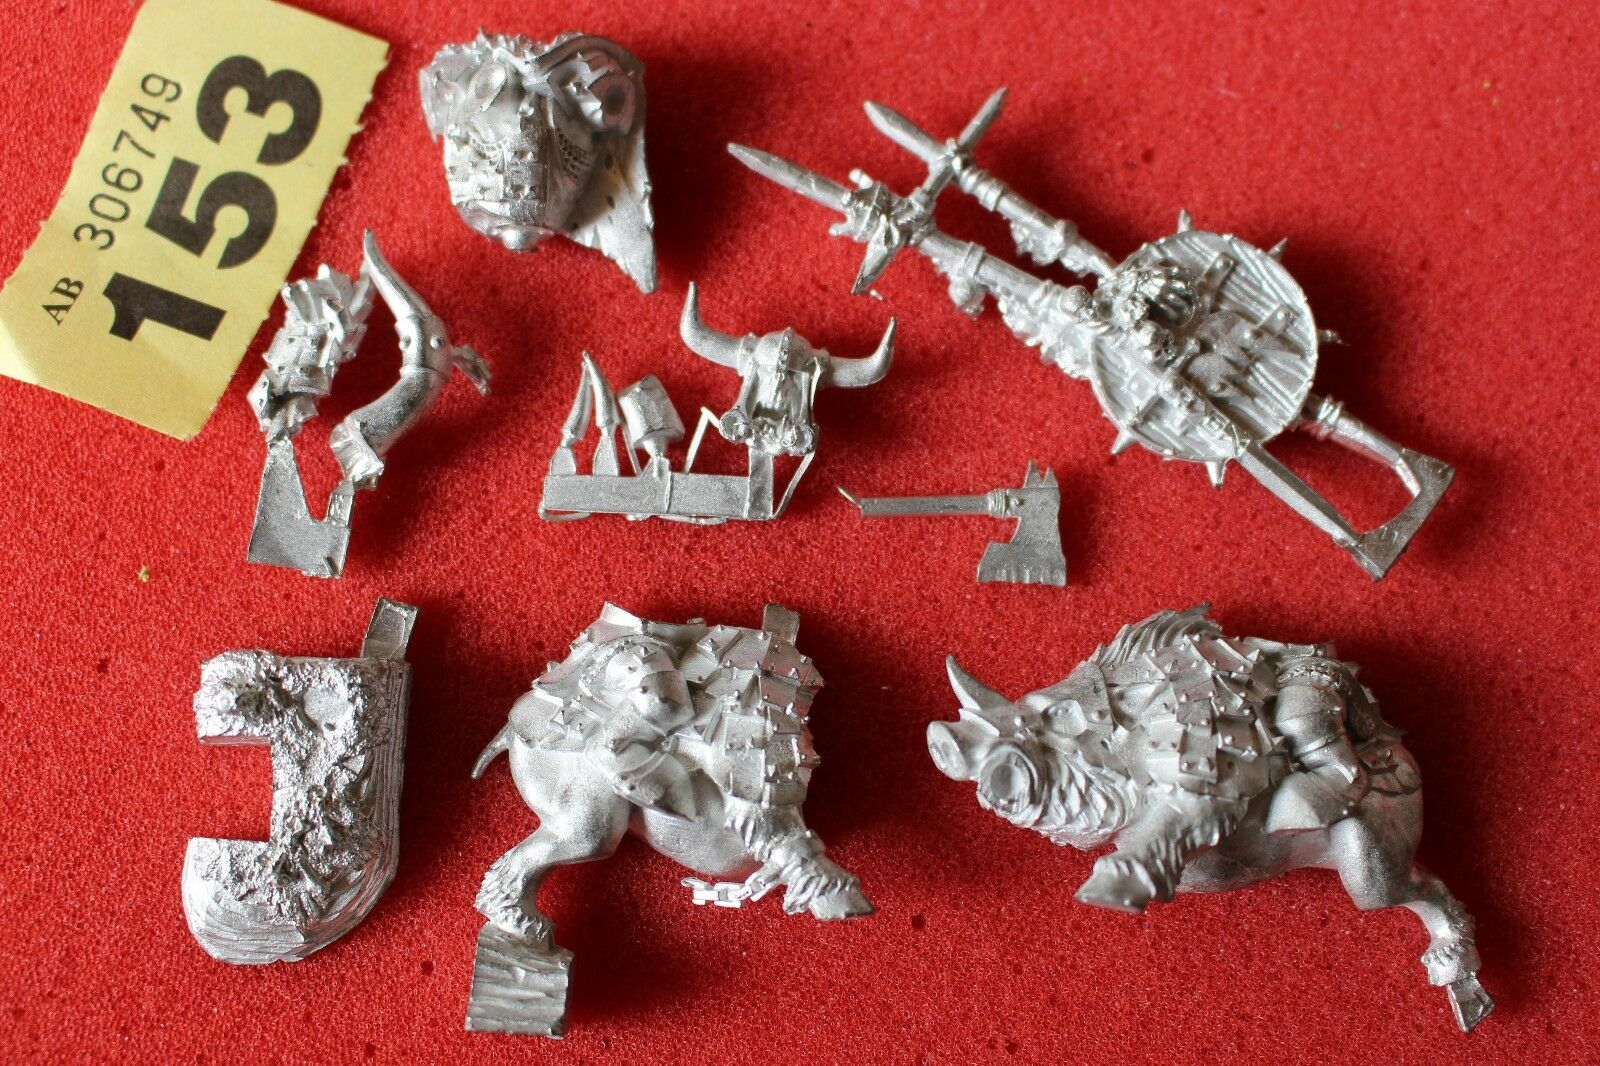 Juegos taller Warhammer Orcos Gorbad ironclaw Metal Figura Set Warboss jabalí fuera de imprenta